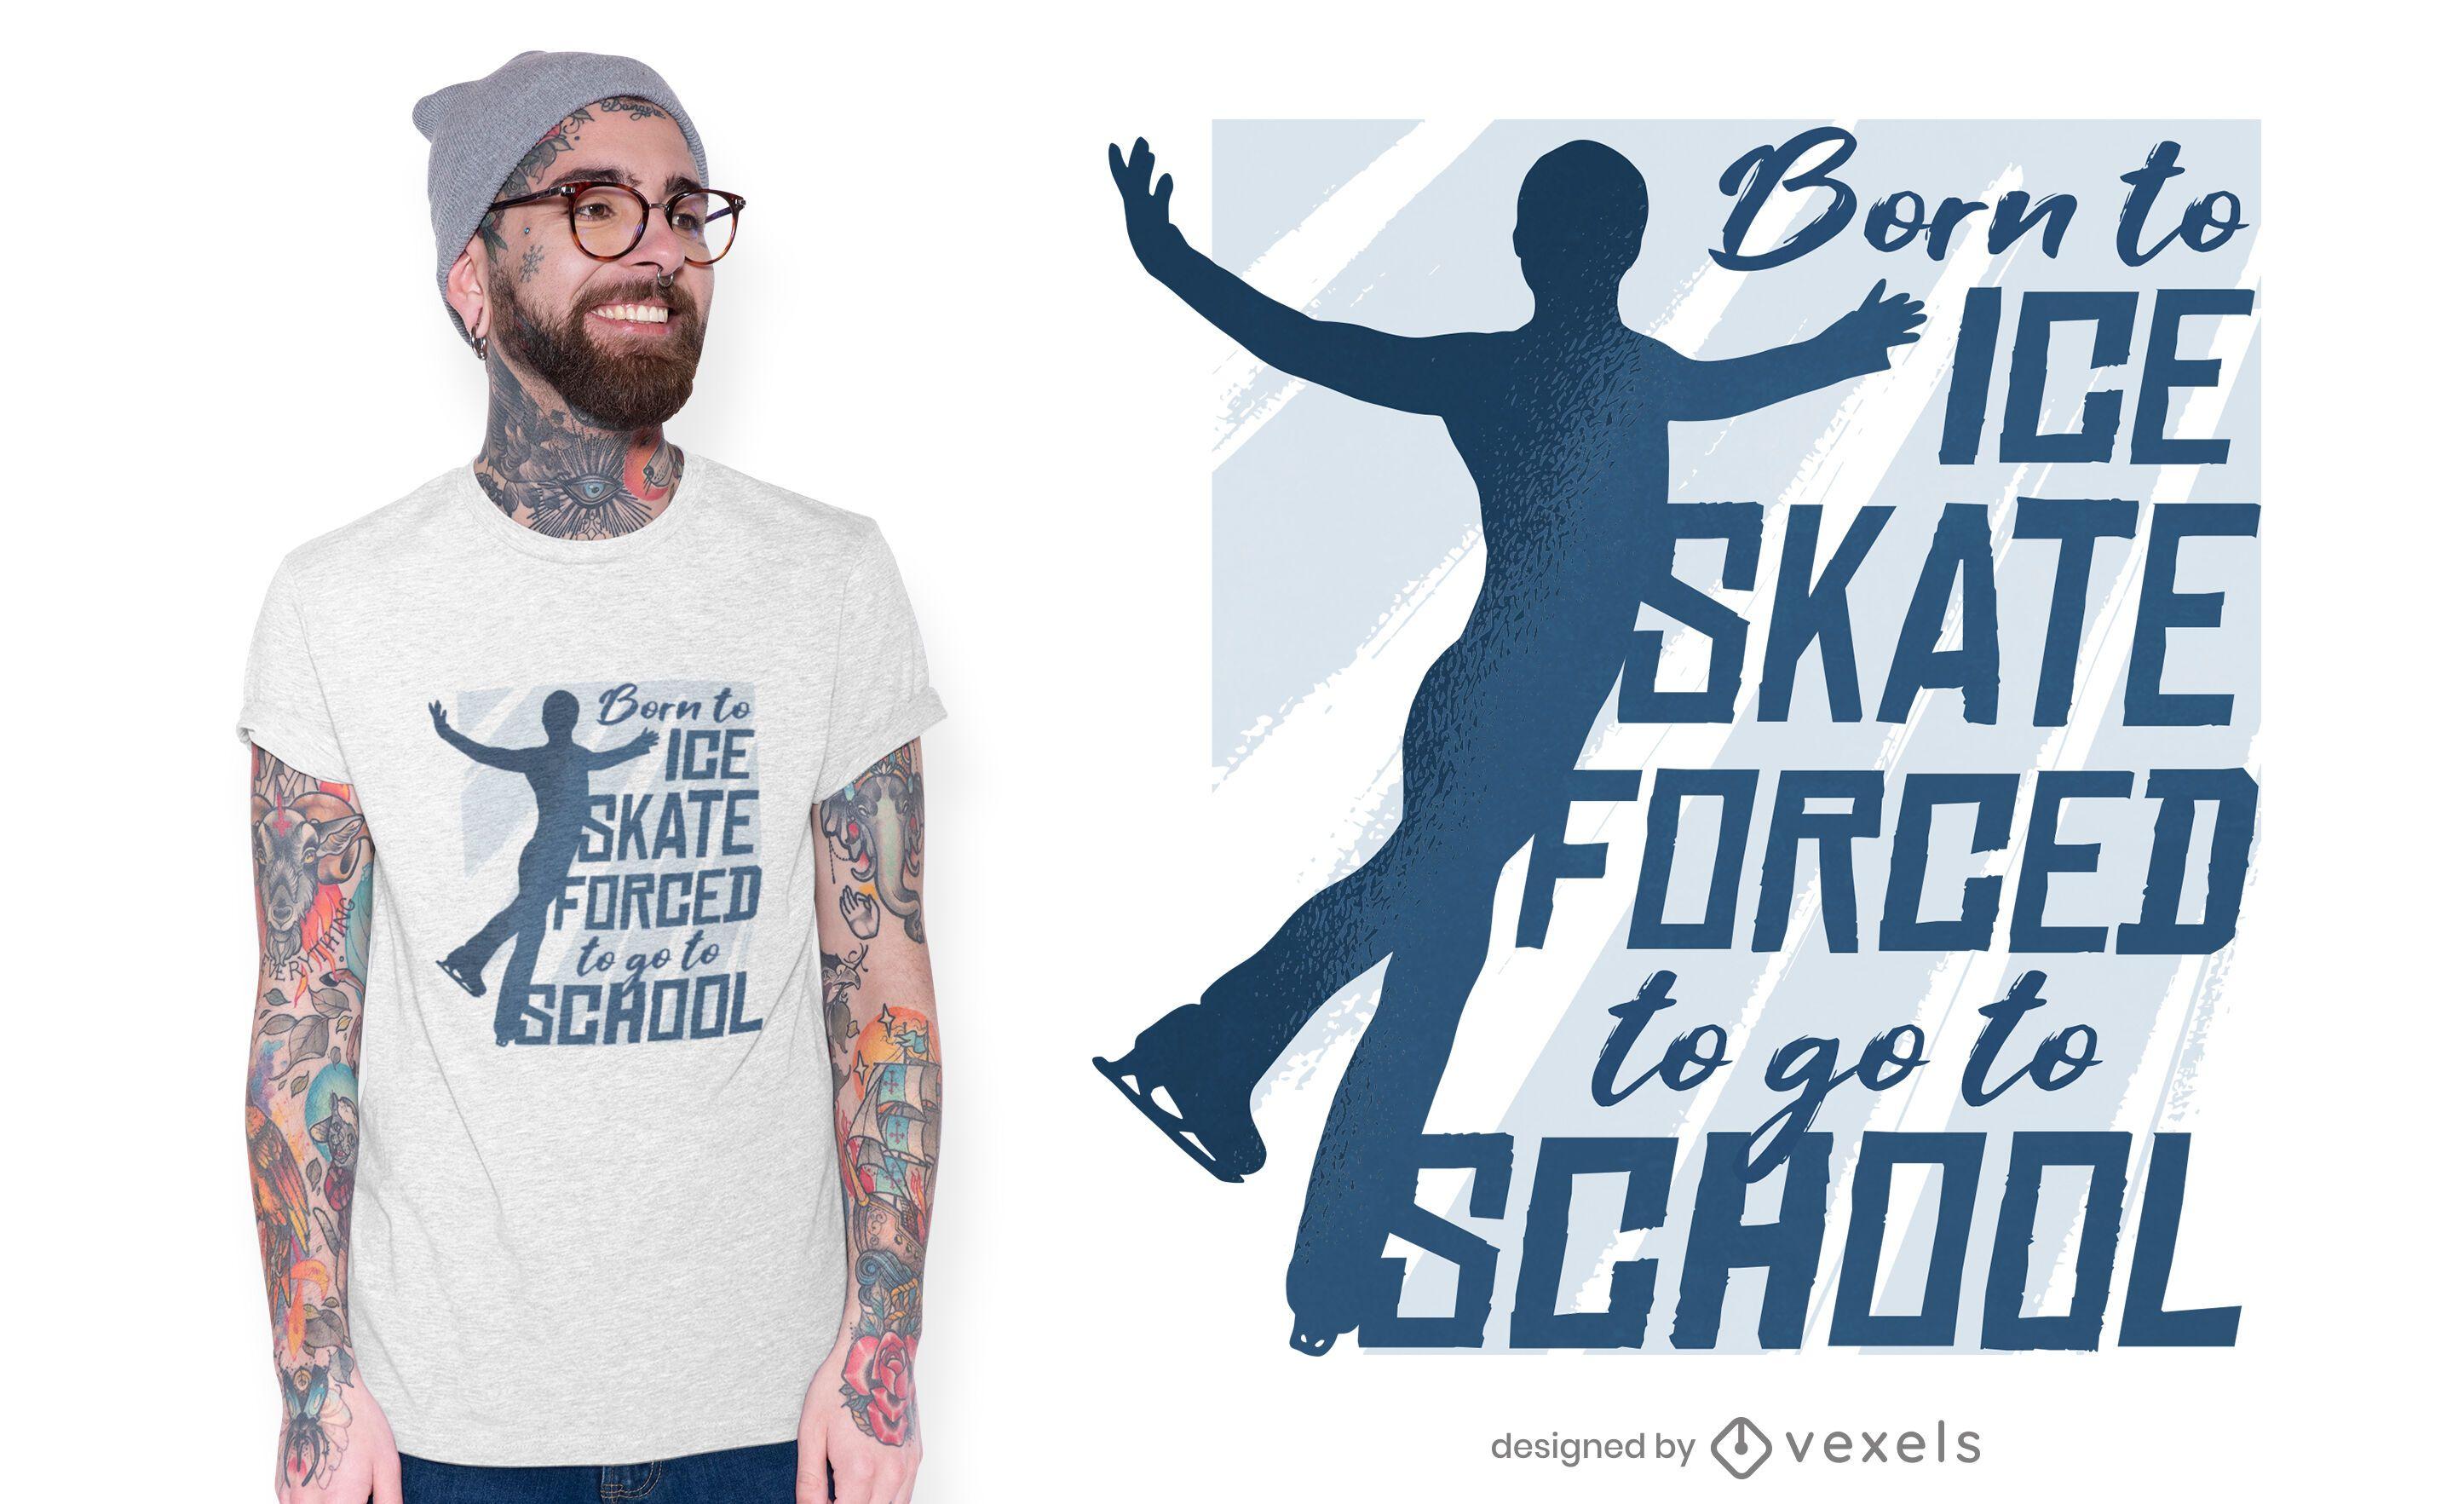 Born to ice skate t-shirt design